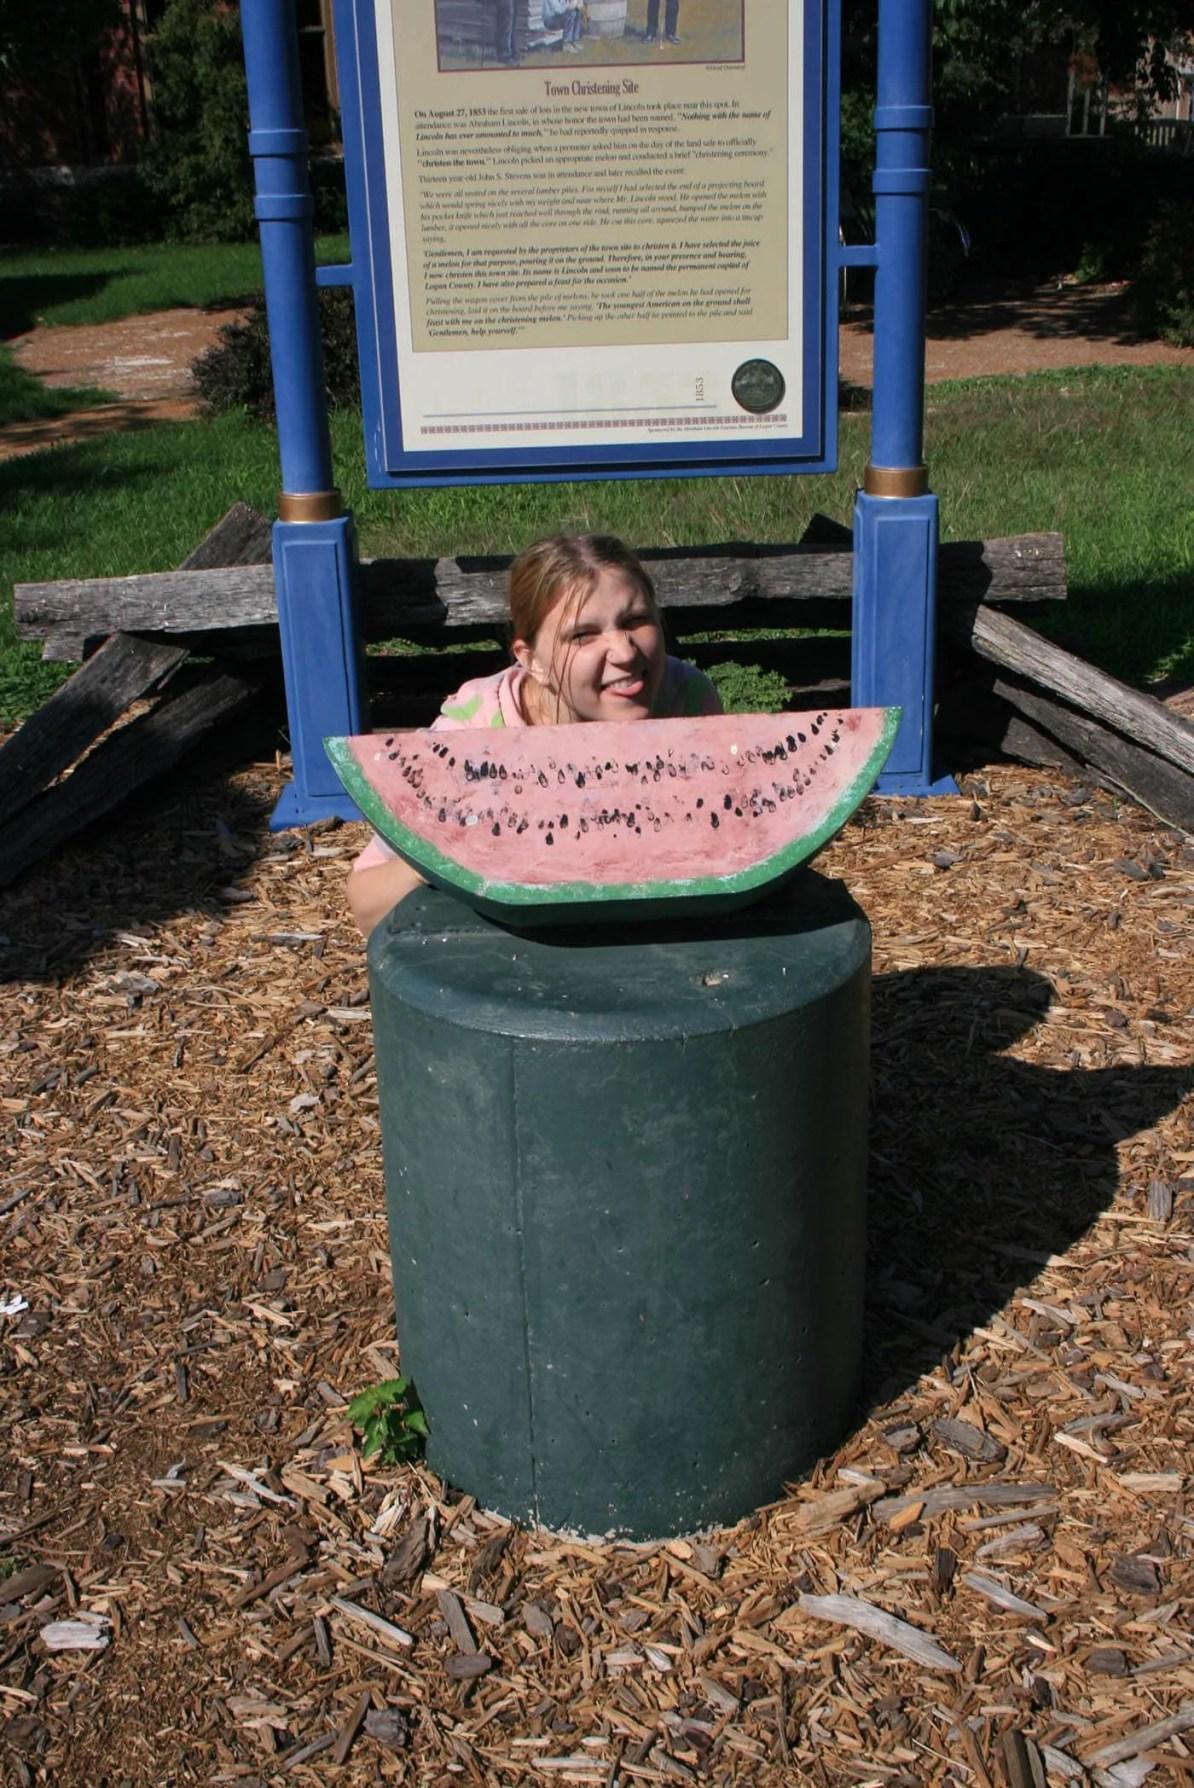 Abraham Lincoln Watermelon Monument in Lincoln, Illinois